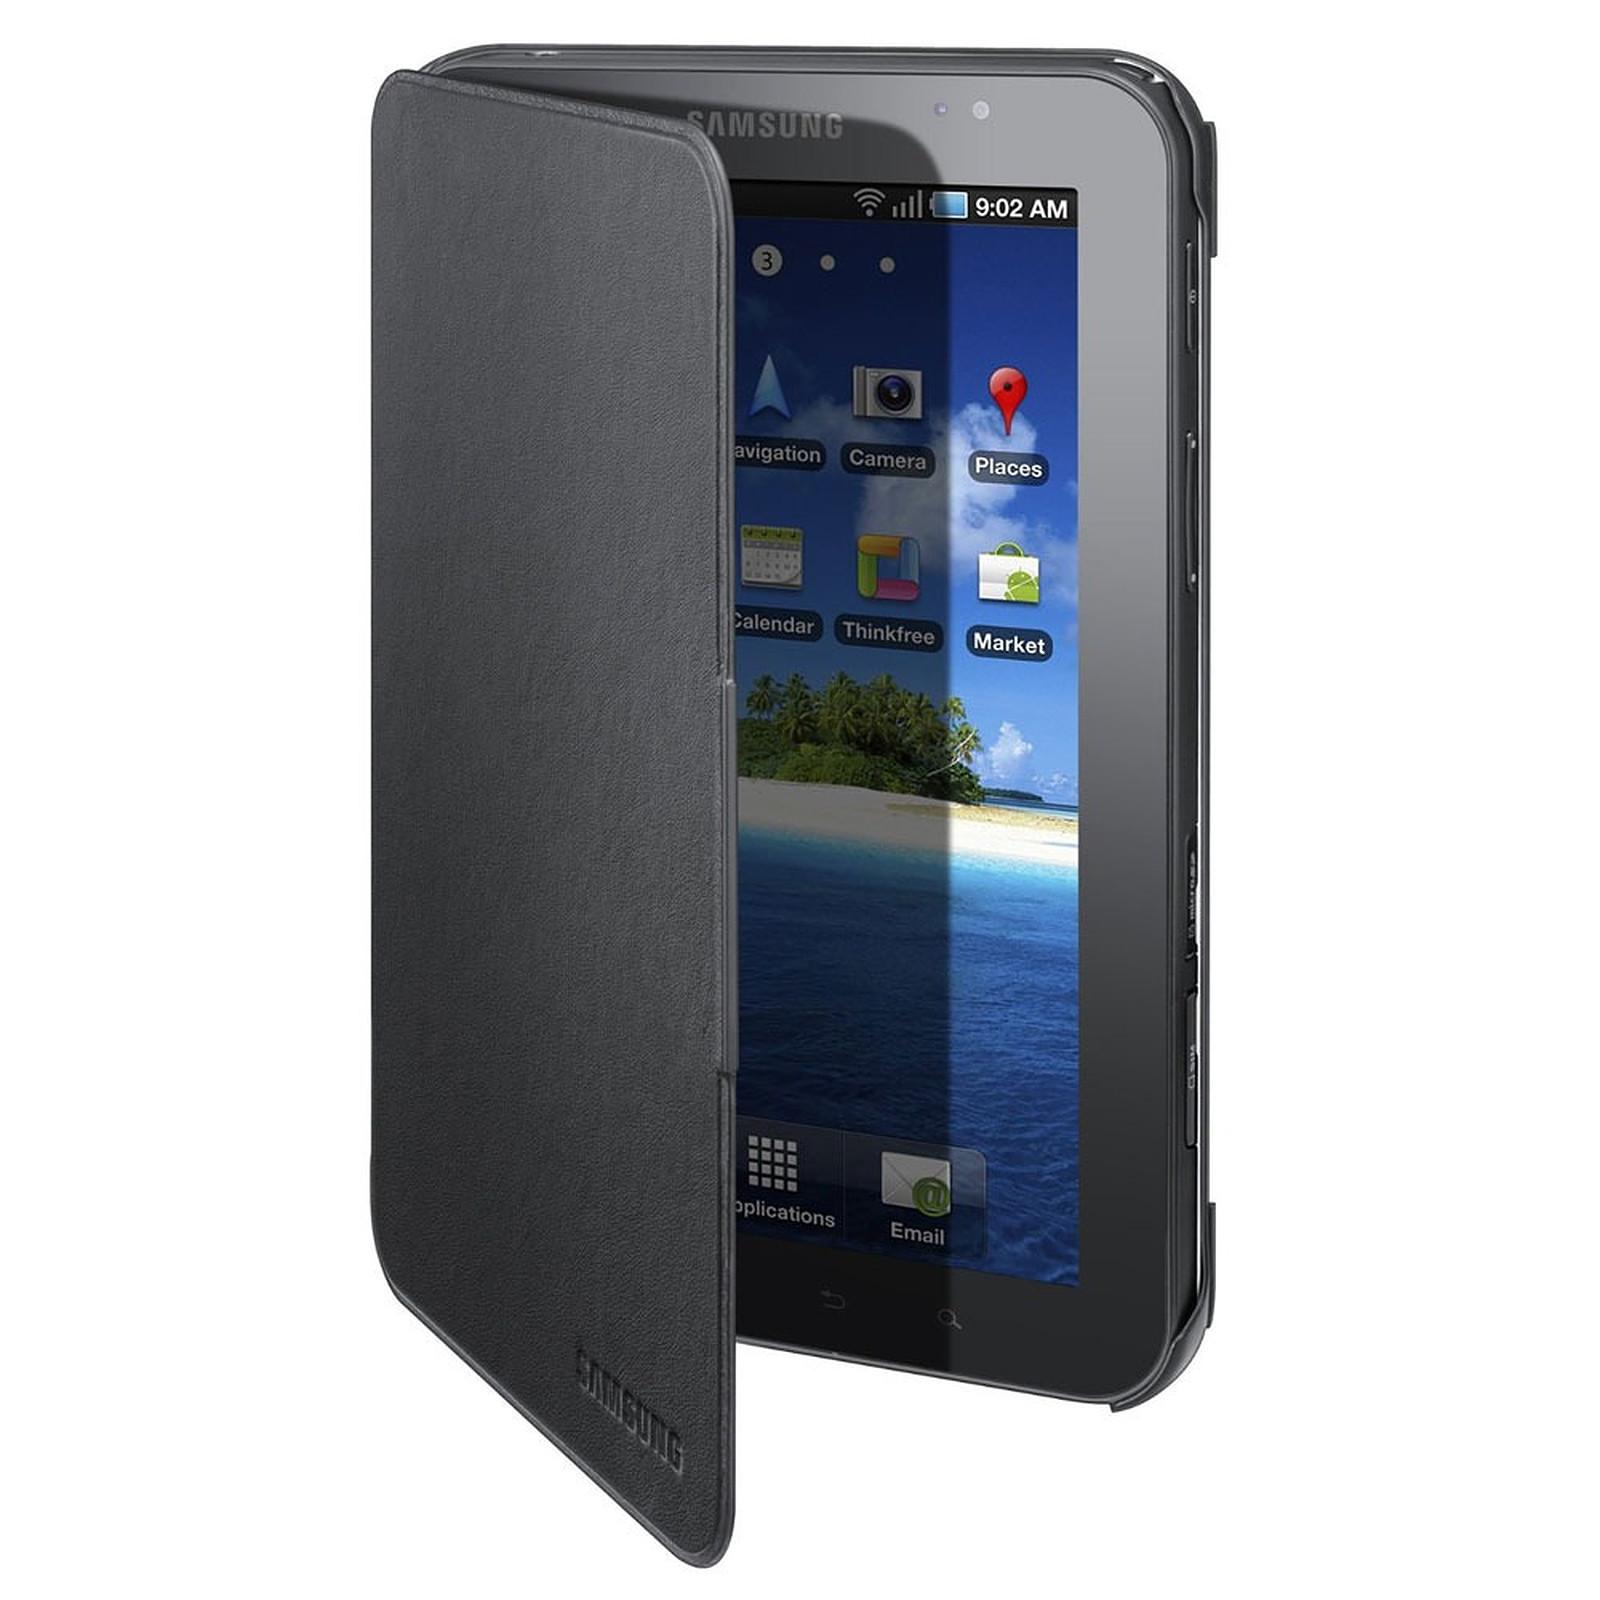 Samsung EF-C980N Noir